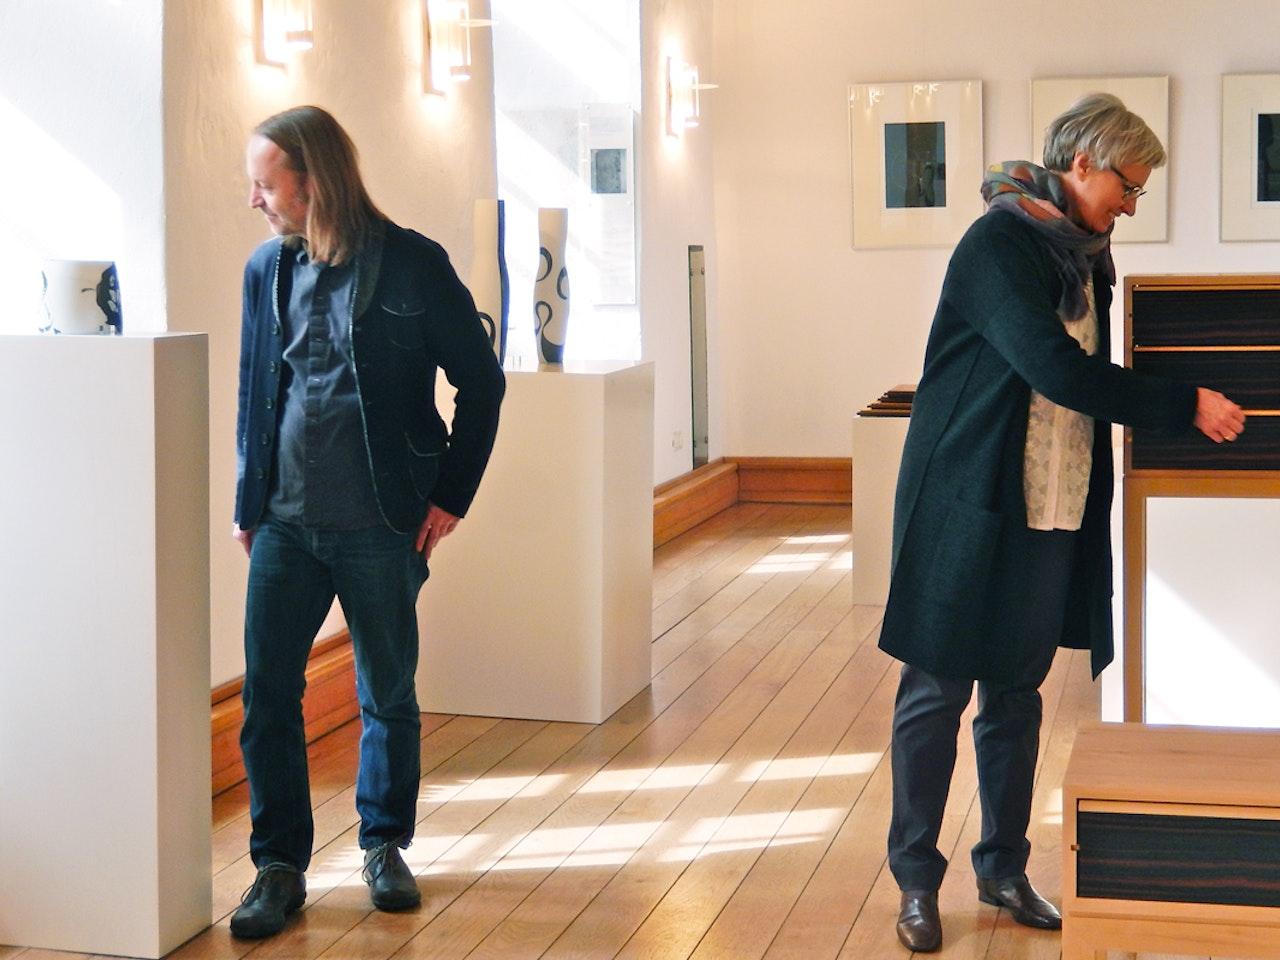 Eröffnung UNIKATE - Martin Wilmes & Karin Bablok   Schloss Landestrost, Neustadt am Rbg